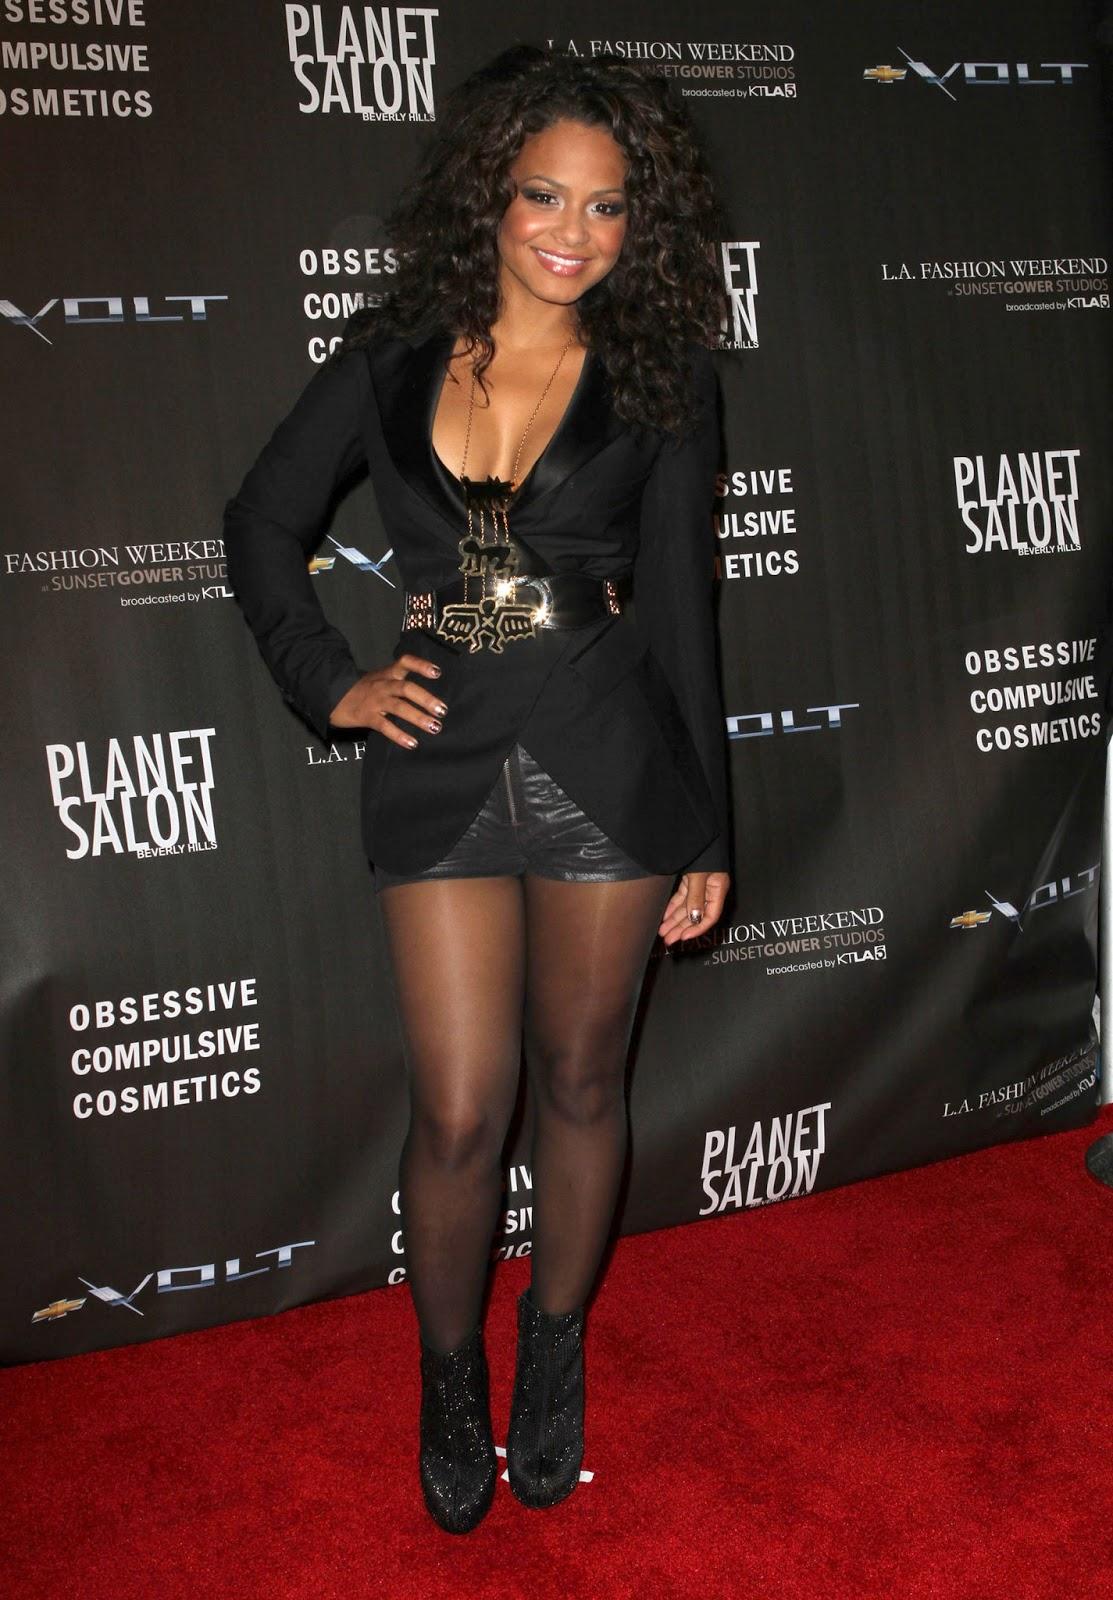 Nylon Celebrities: Christina Milian